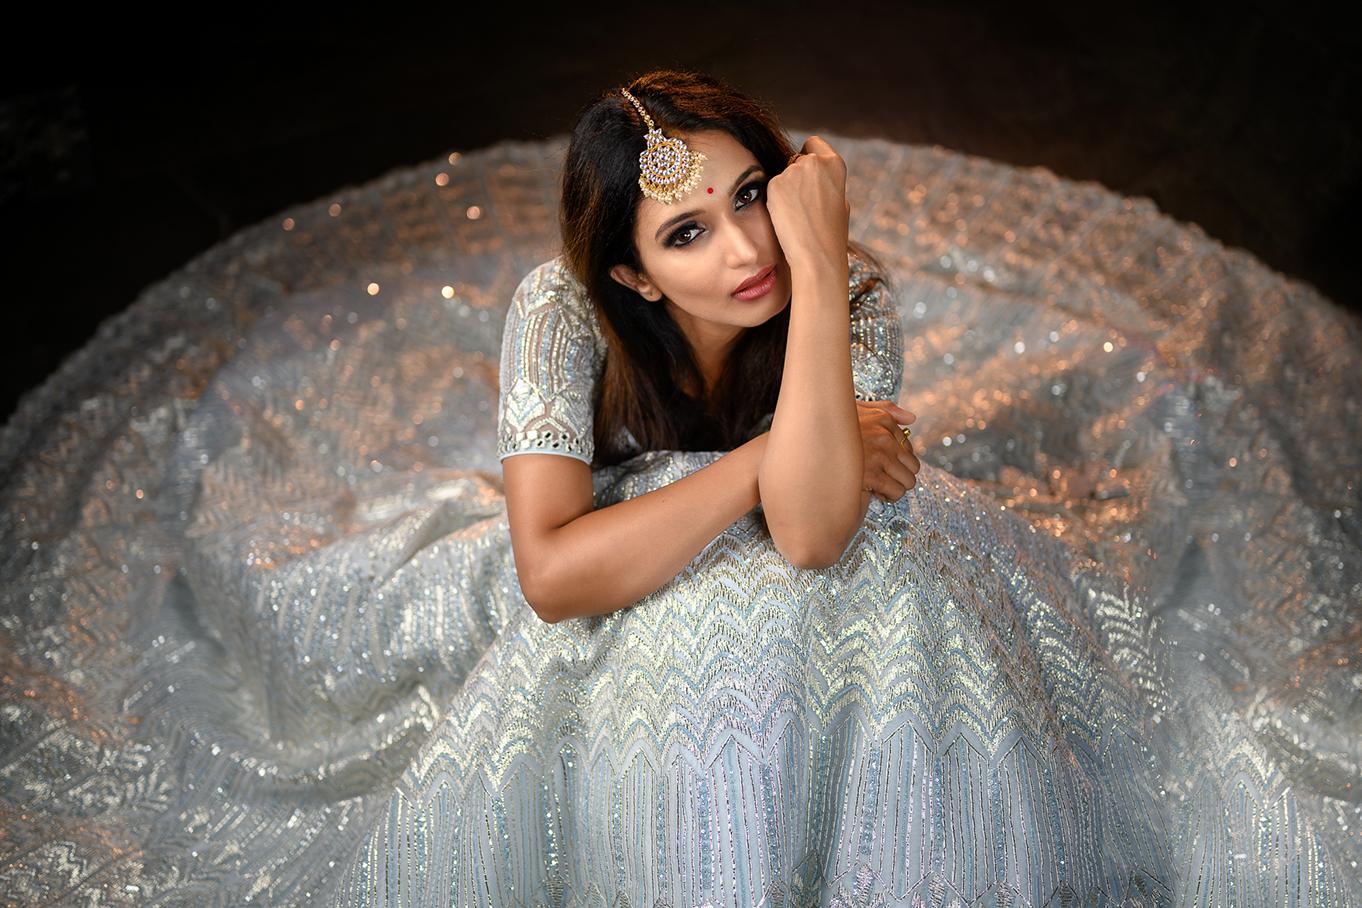 Celebrity Portrait of Kavyashree, Kannada TV Actress of Big Boss fame